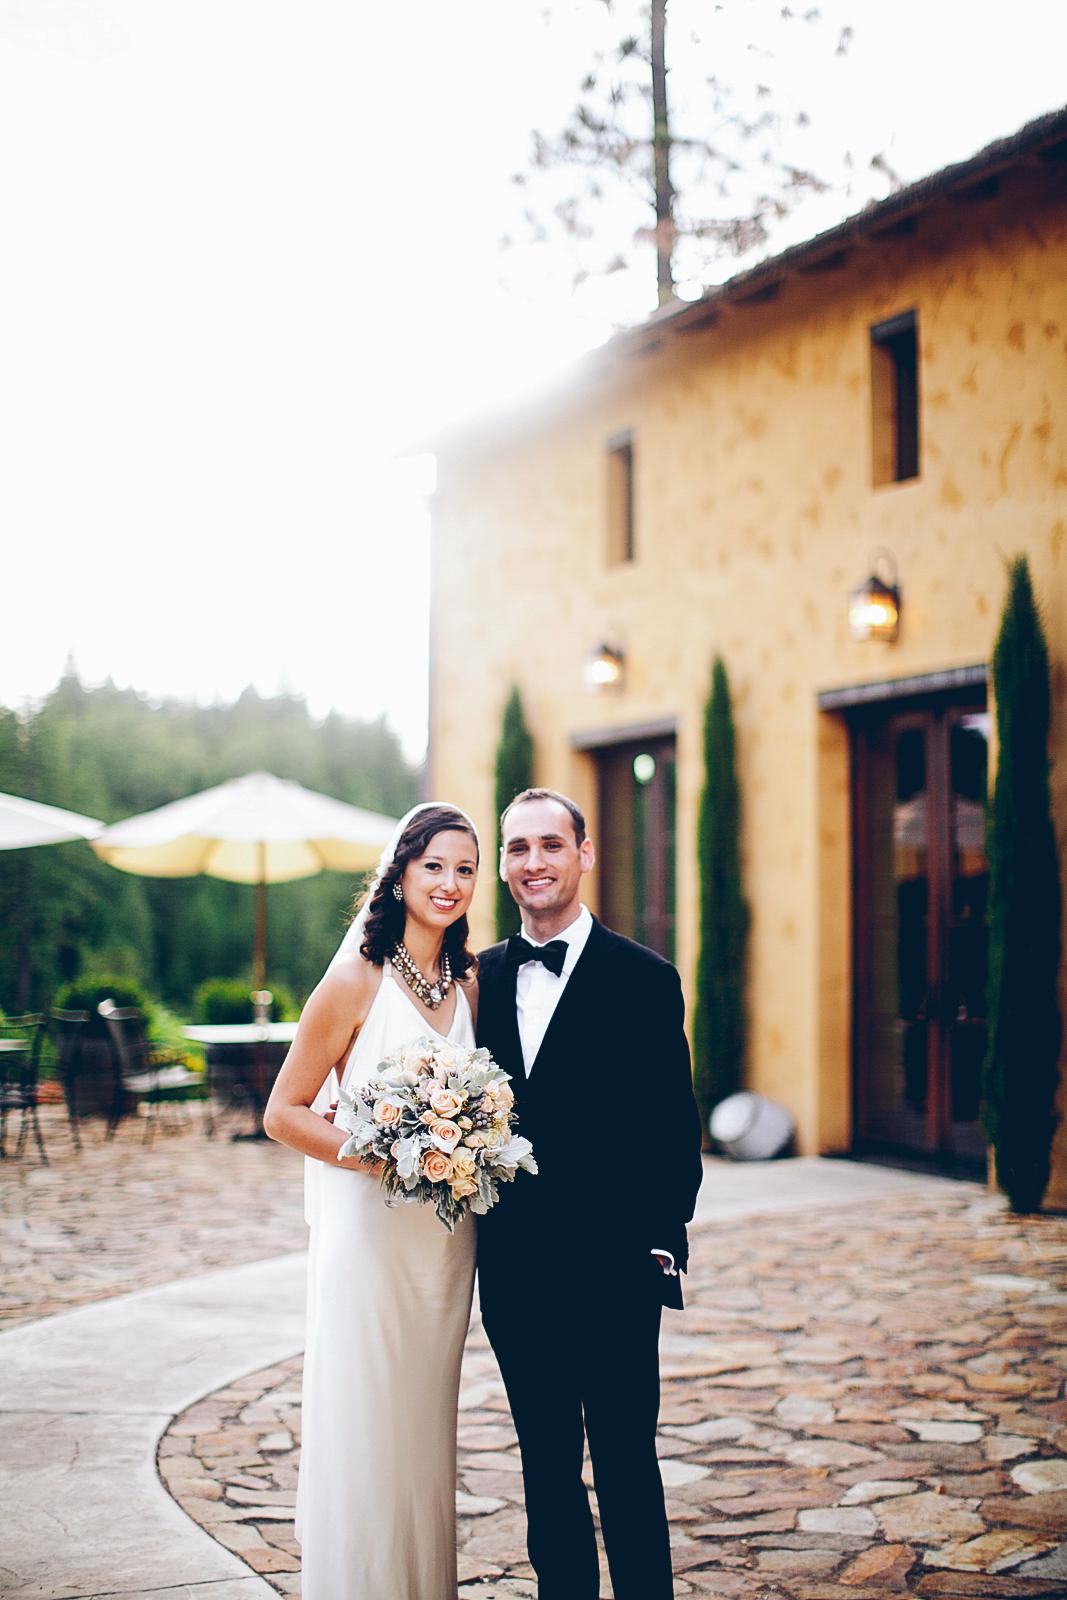 miraflores_winery_wedding_photography_ian_melissa_ebony_siovhan_bokeh_photography_33.jpg